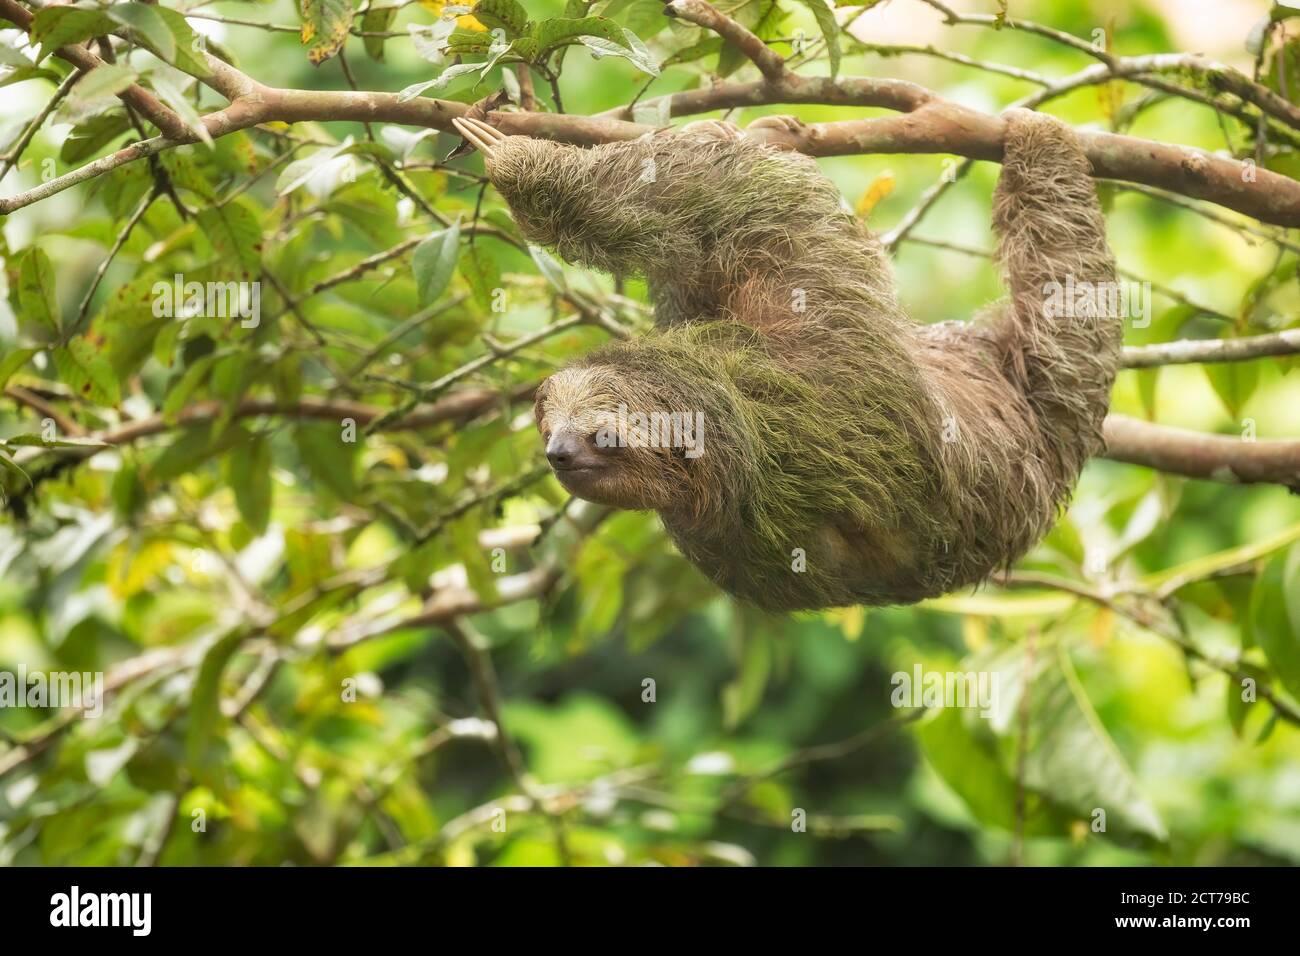 Brown-throated three-toed sloth (Bradypus variegatus) in rainforest habitat, Costa Rica Stock Photo